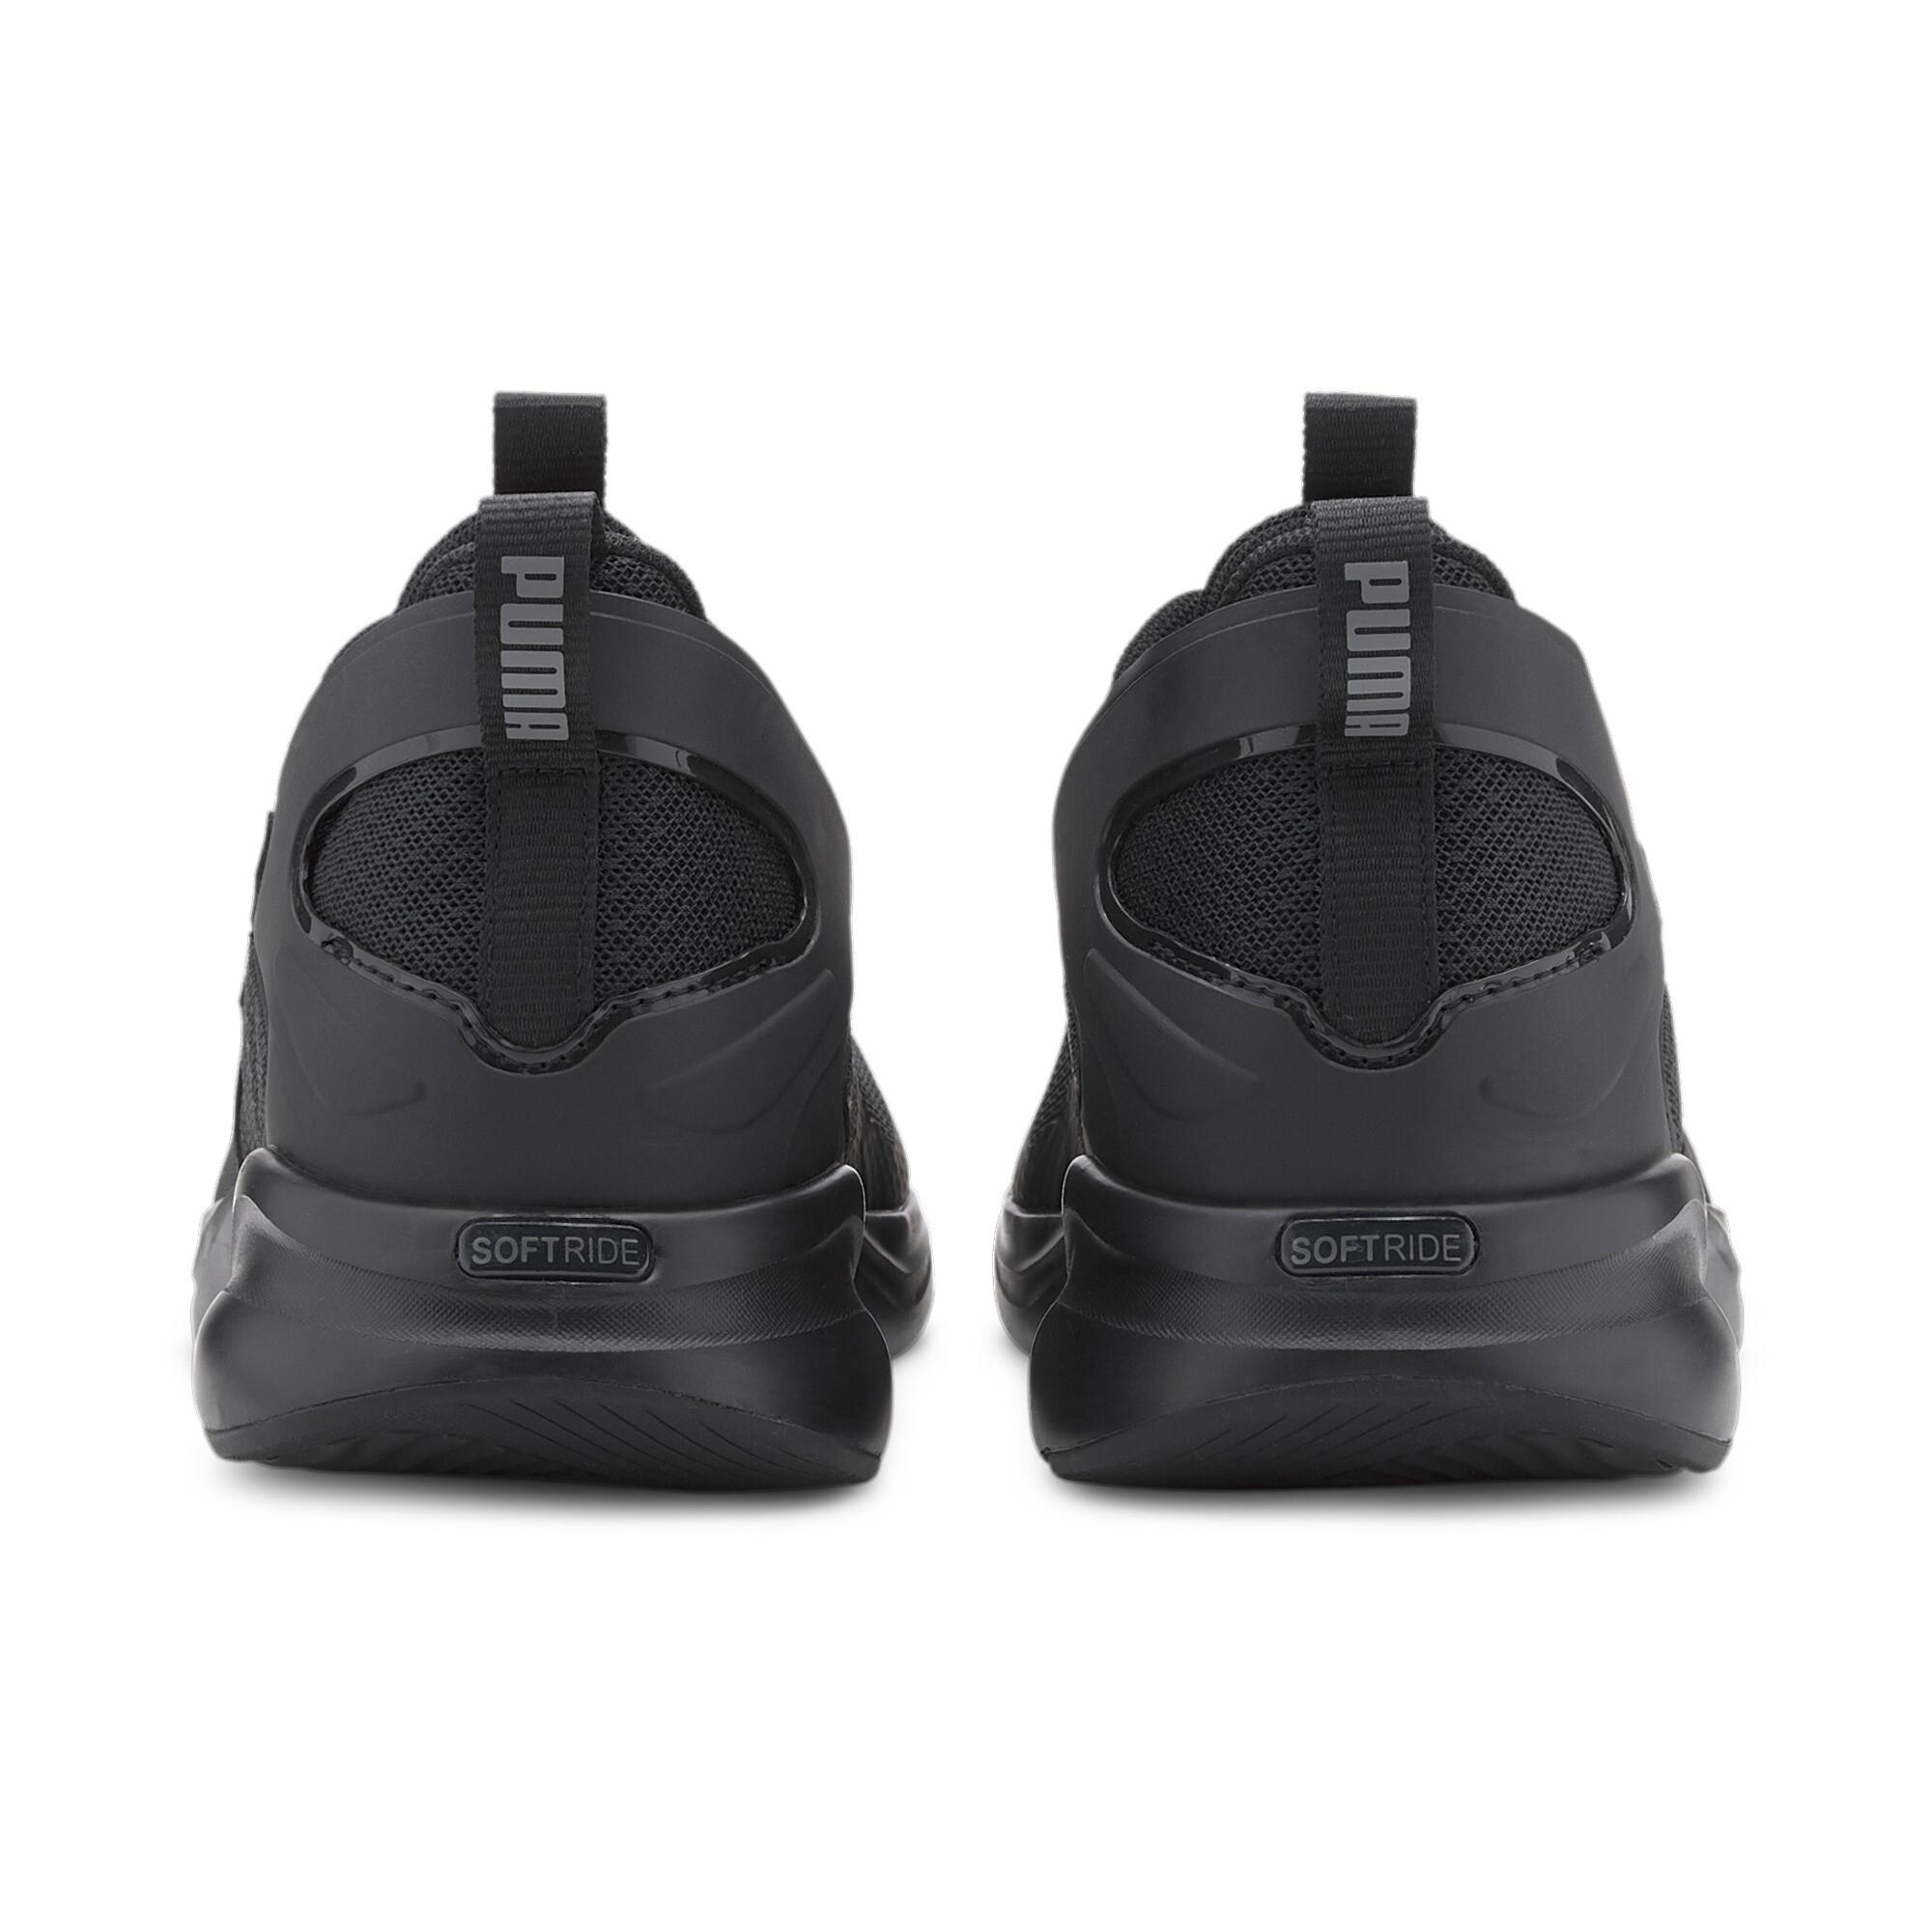 thumbnail 15 - PUMA Men's SoftRide Rift Running Shoes